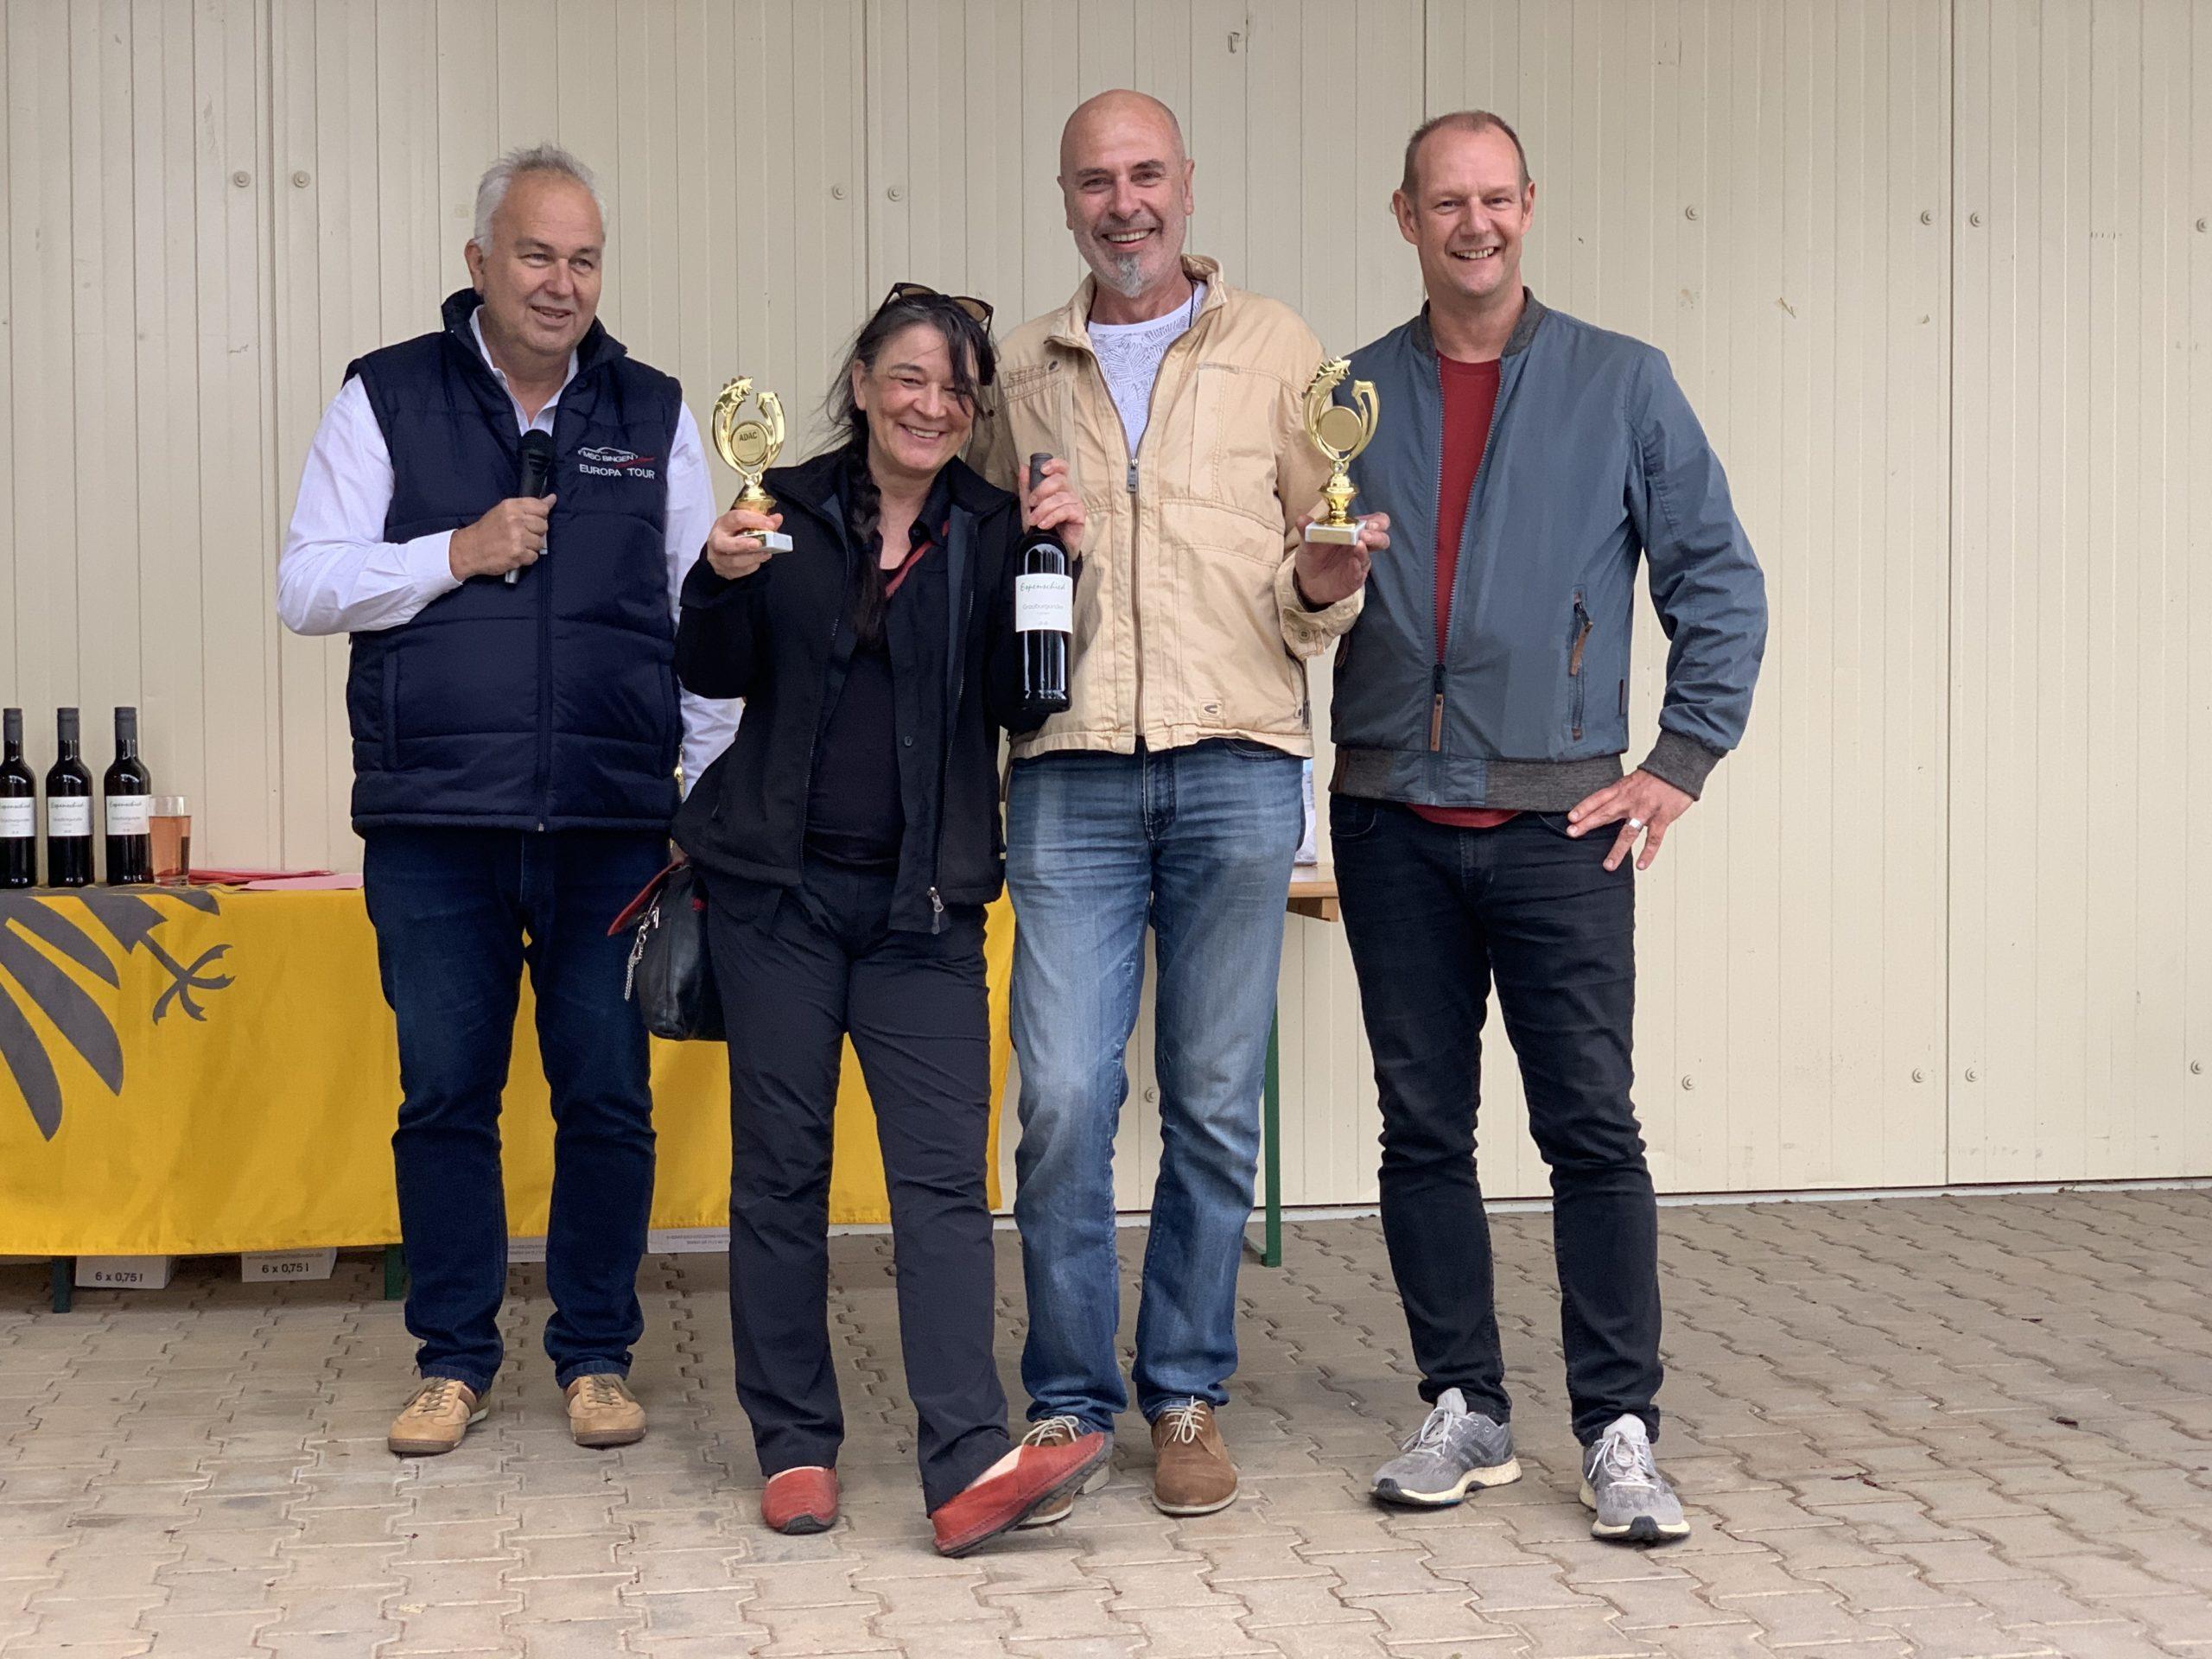 MSC Bingen 2020 Mäuseturm Klassik - Siegerehrung